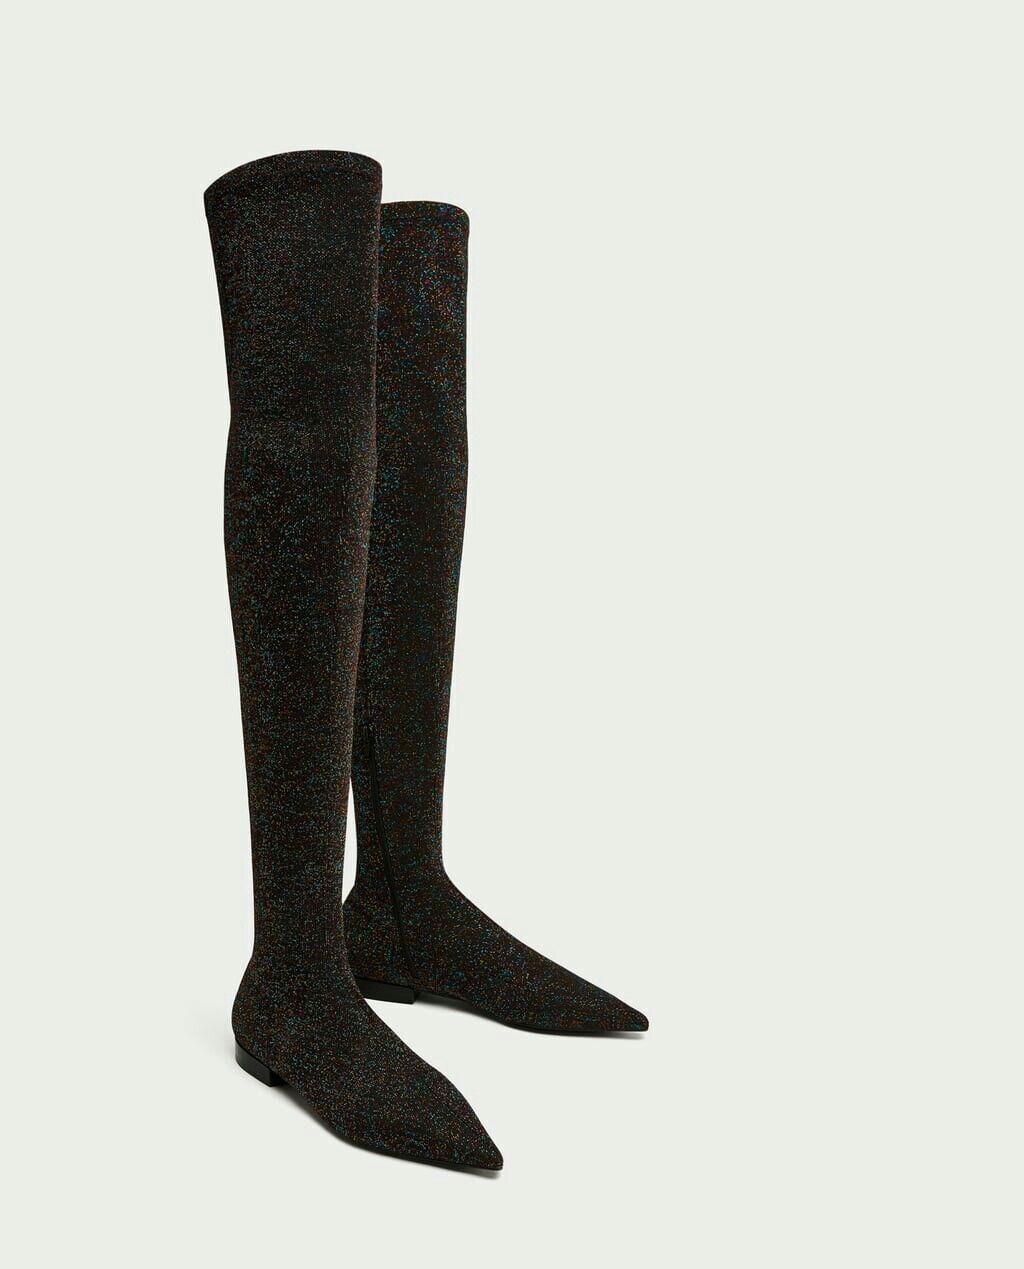 Zara multi colour glitter over the knee boots UK size 5 EUR 38